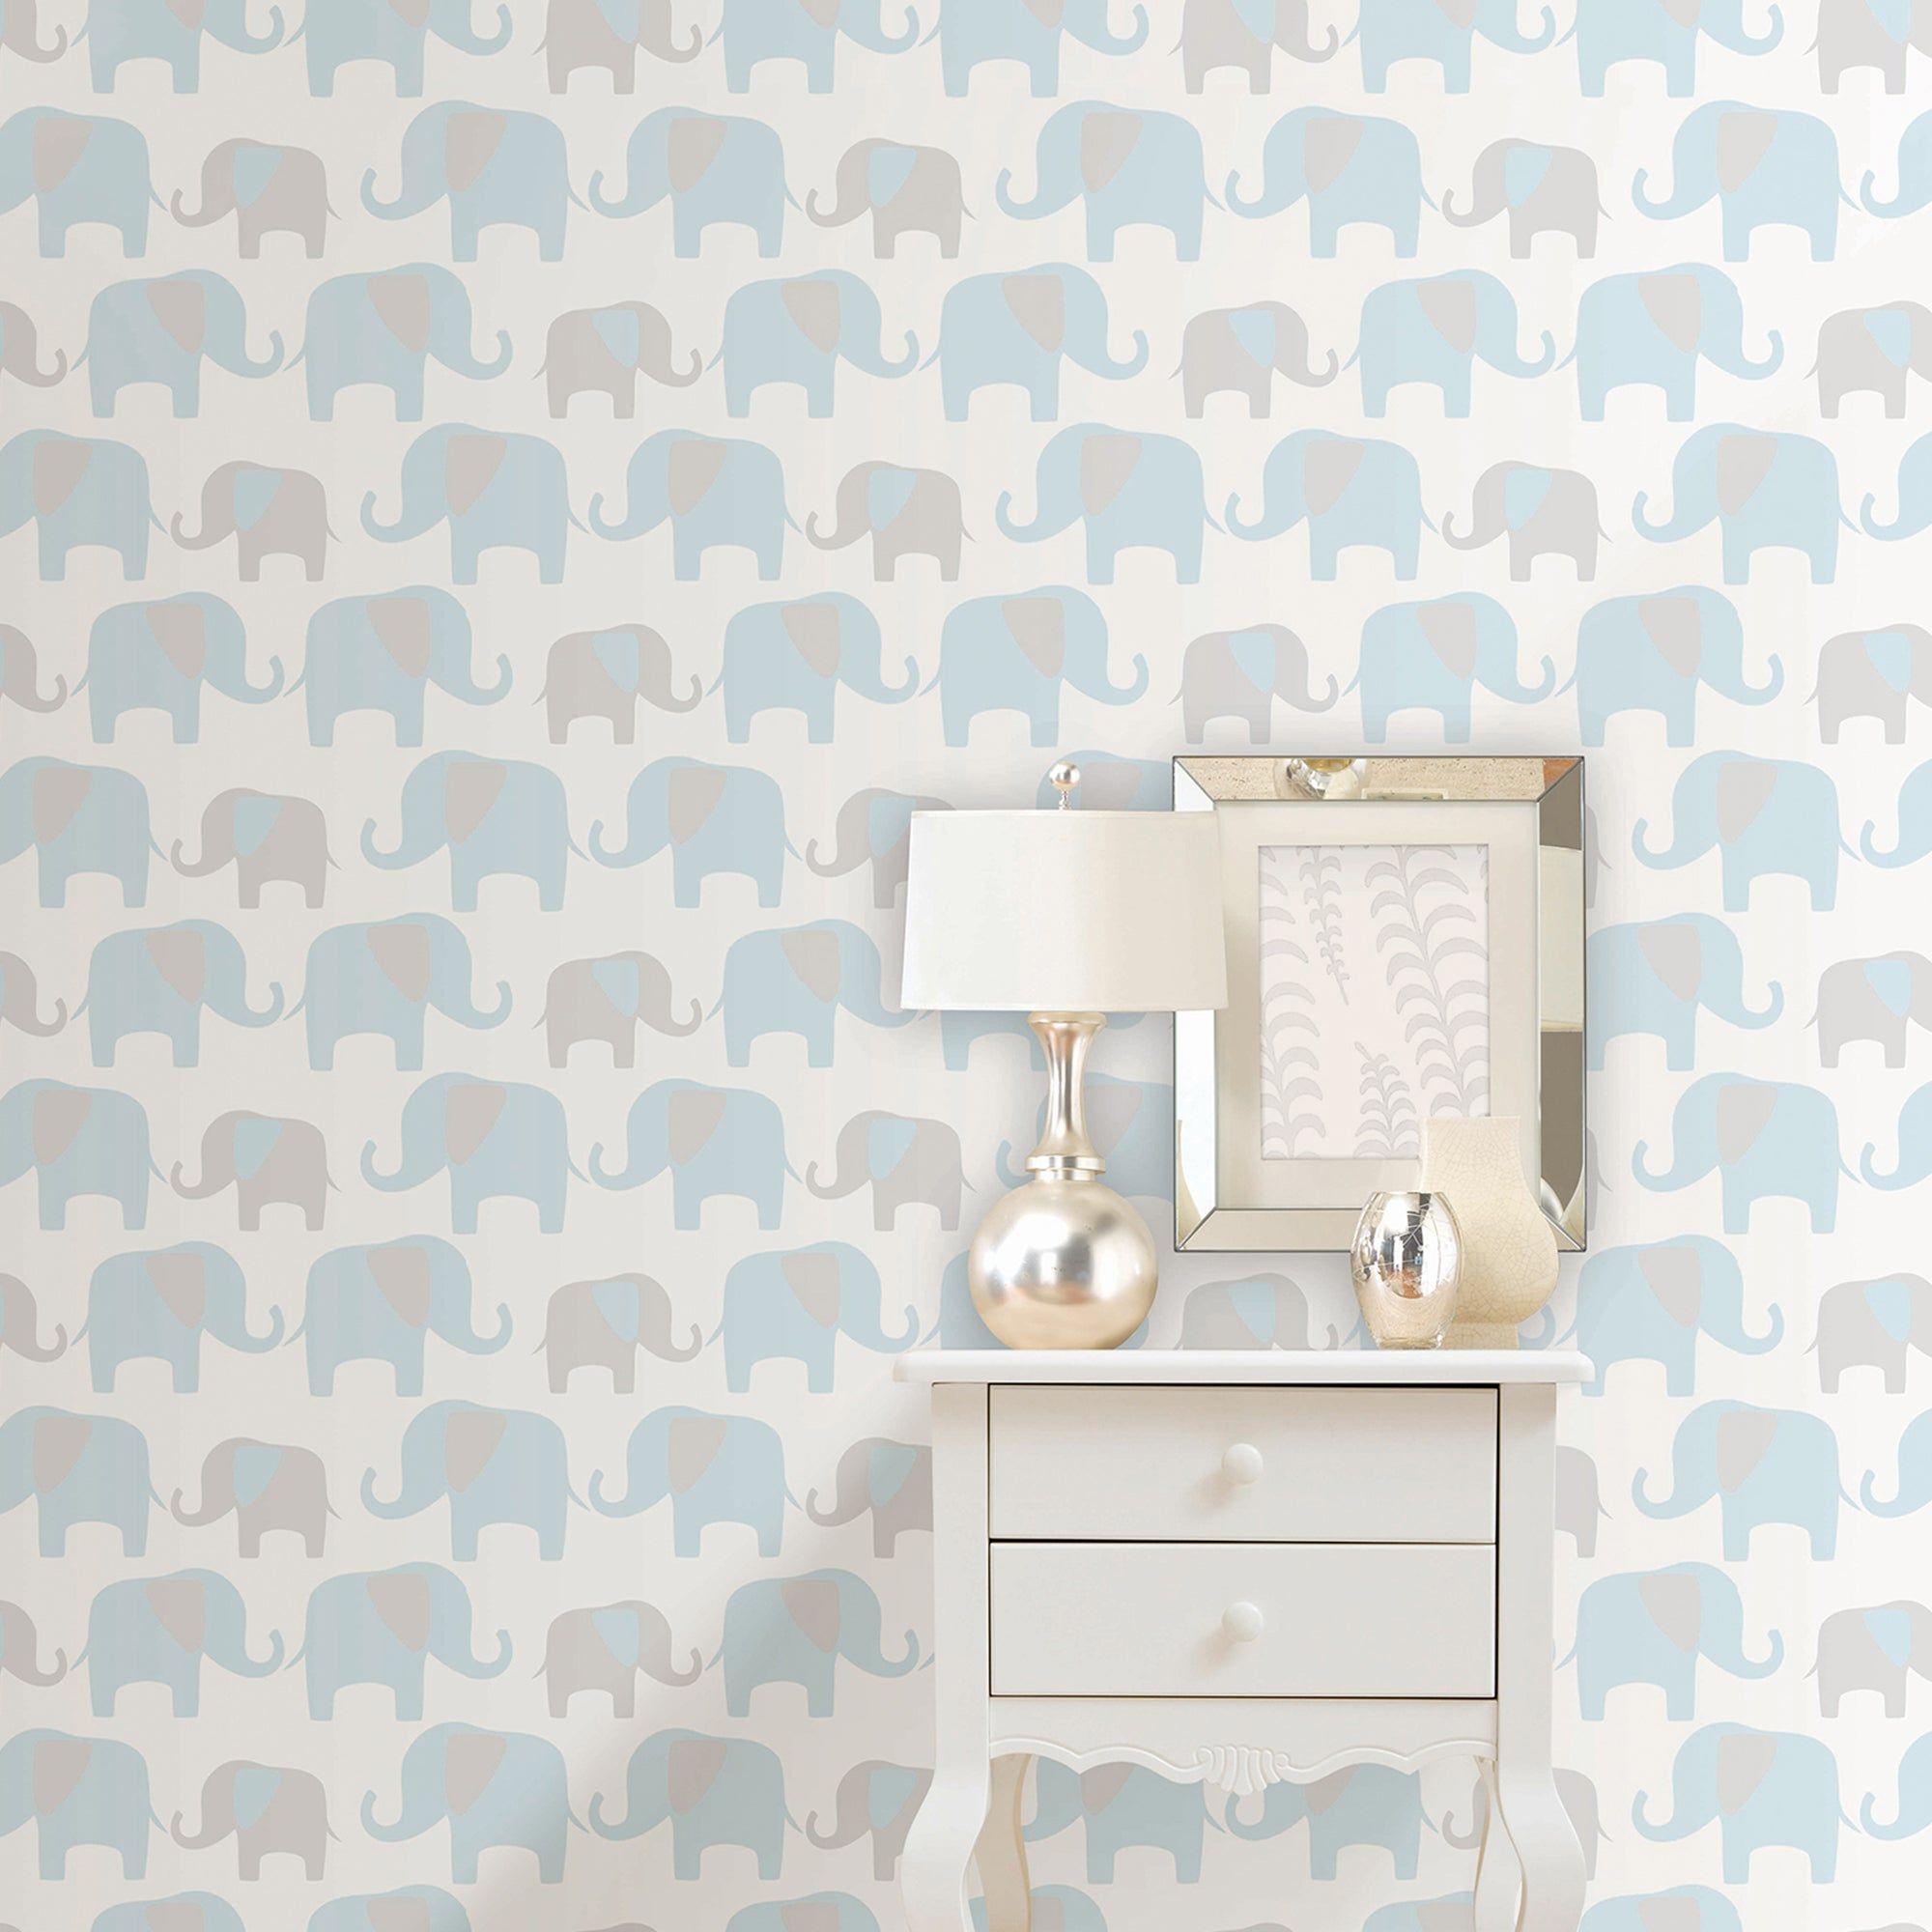 Nuwallpaper Elephant Parade Blue Self Adhesive Wallpaper Self Adhesive Wallpaper Nursery Wallpaper Wallpaper Walls Decor